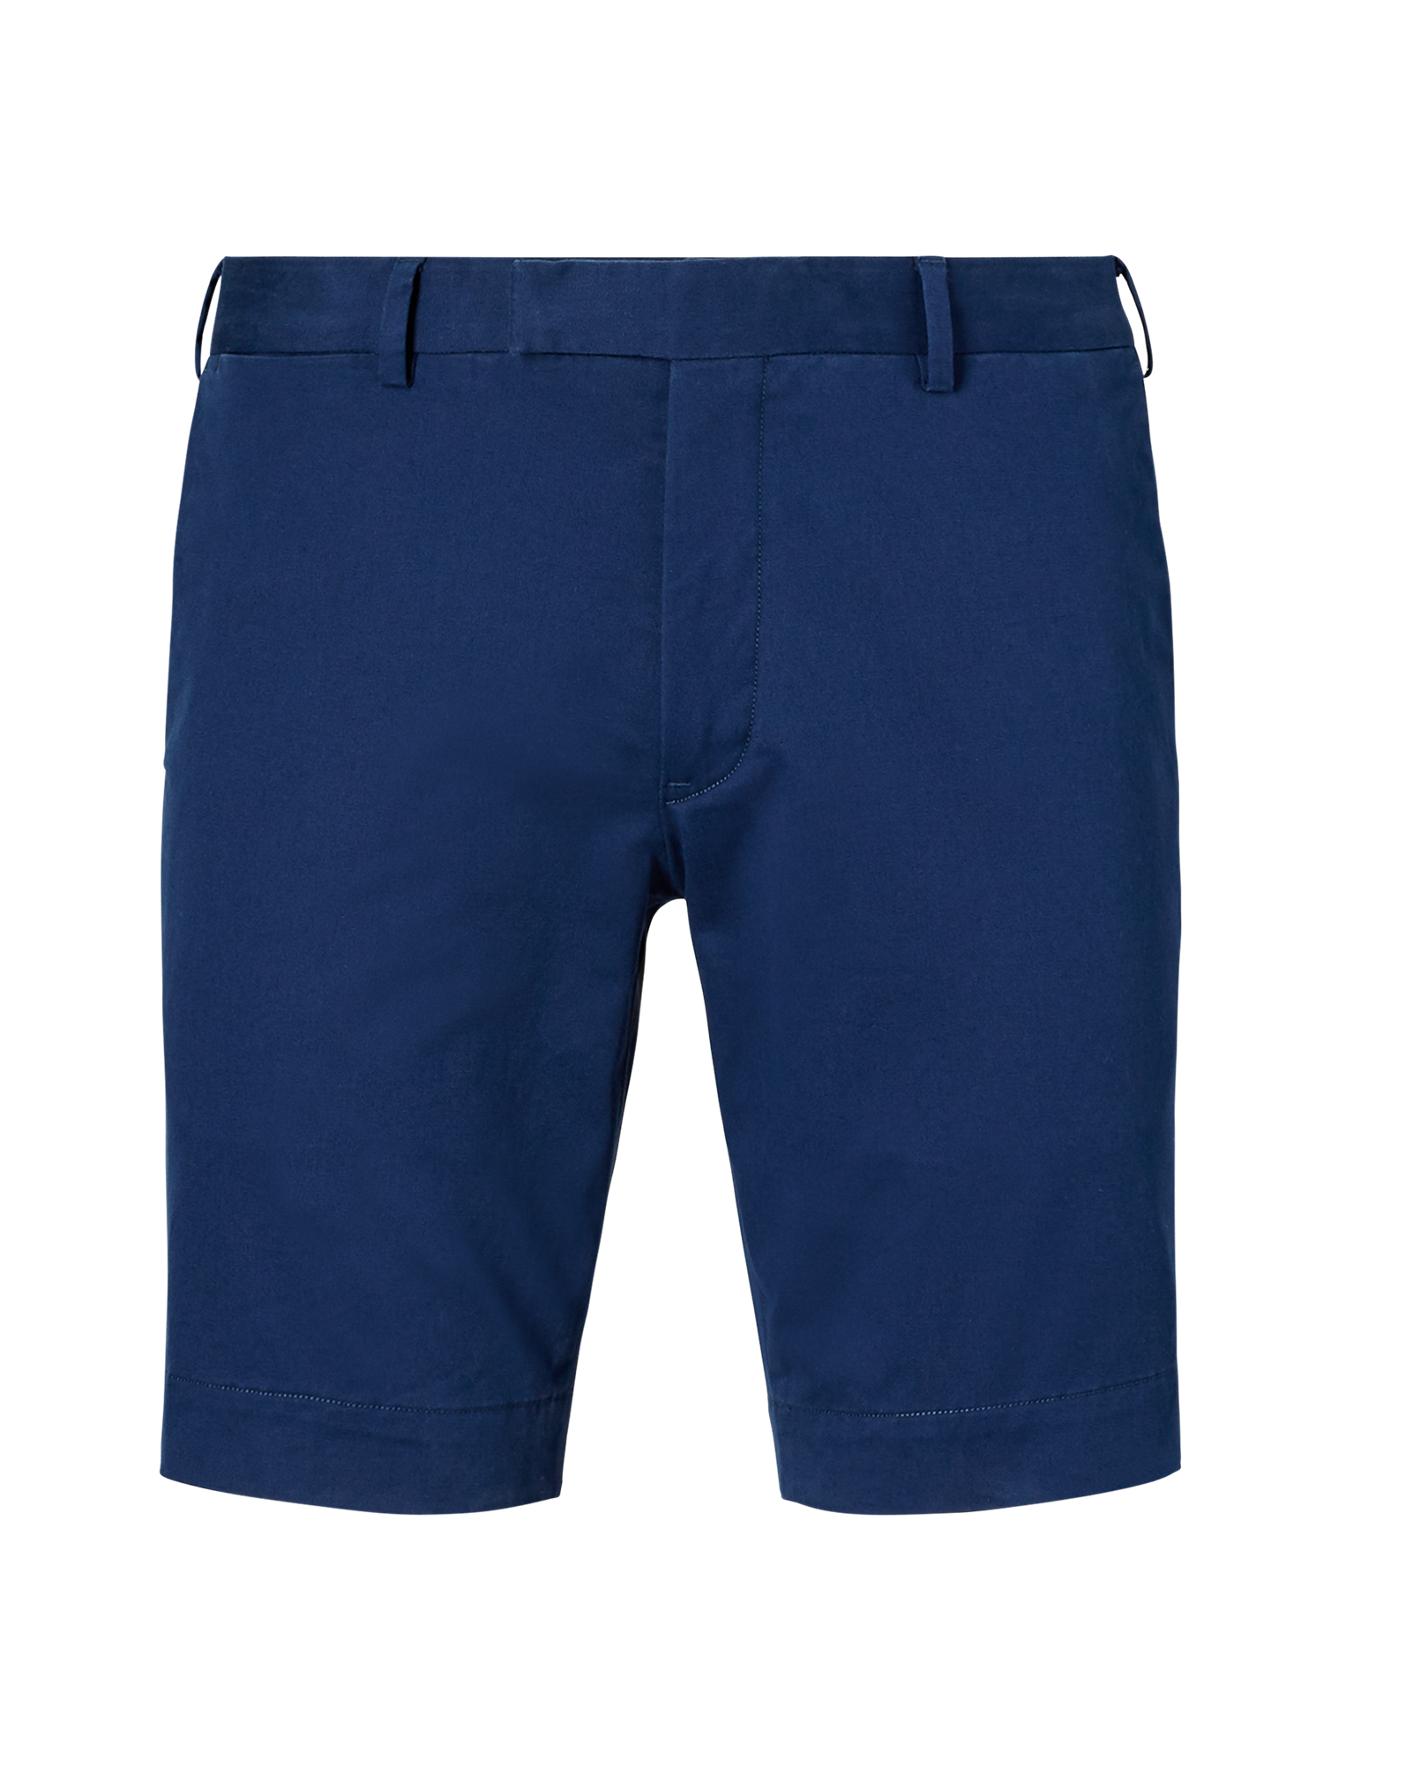 Stretch Slim Fit Twill Short - Shorts Shorts & Swimwear ...